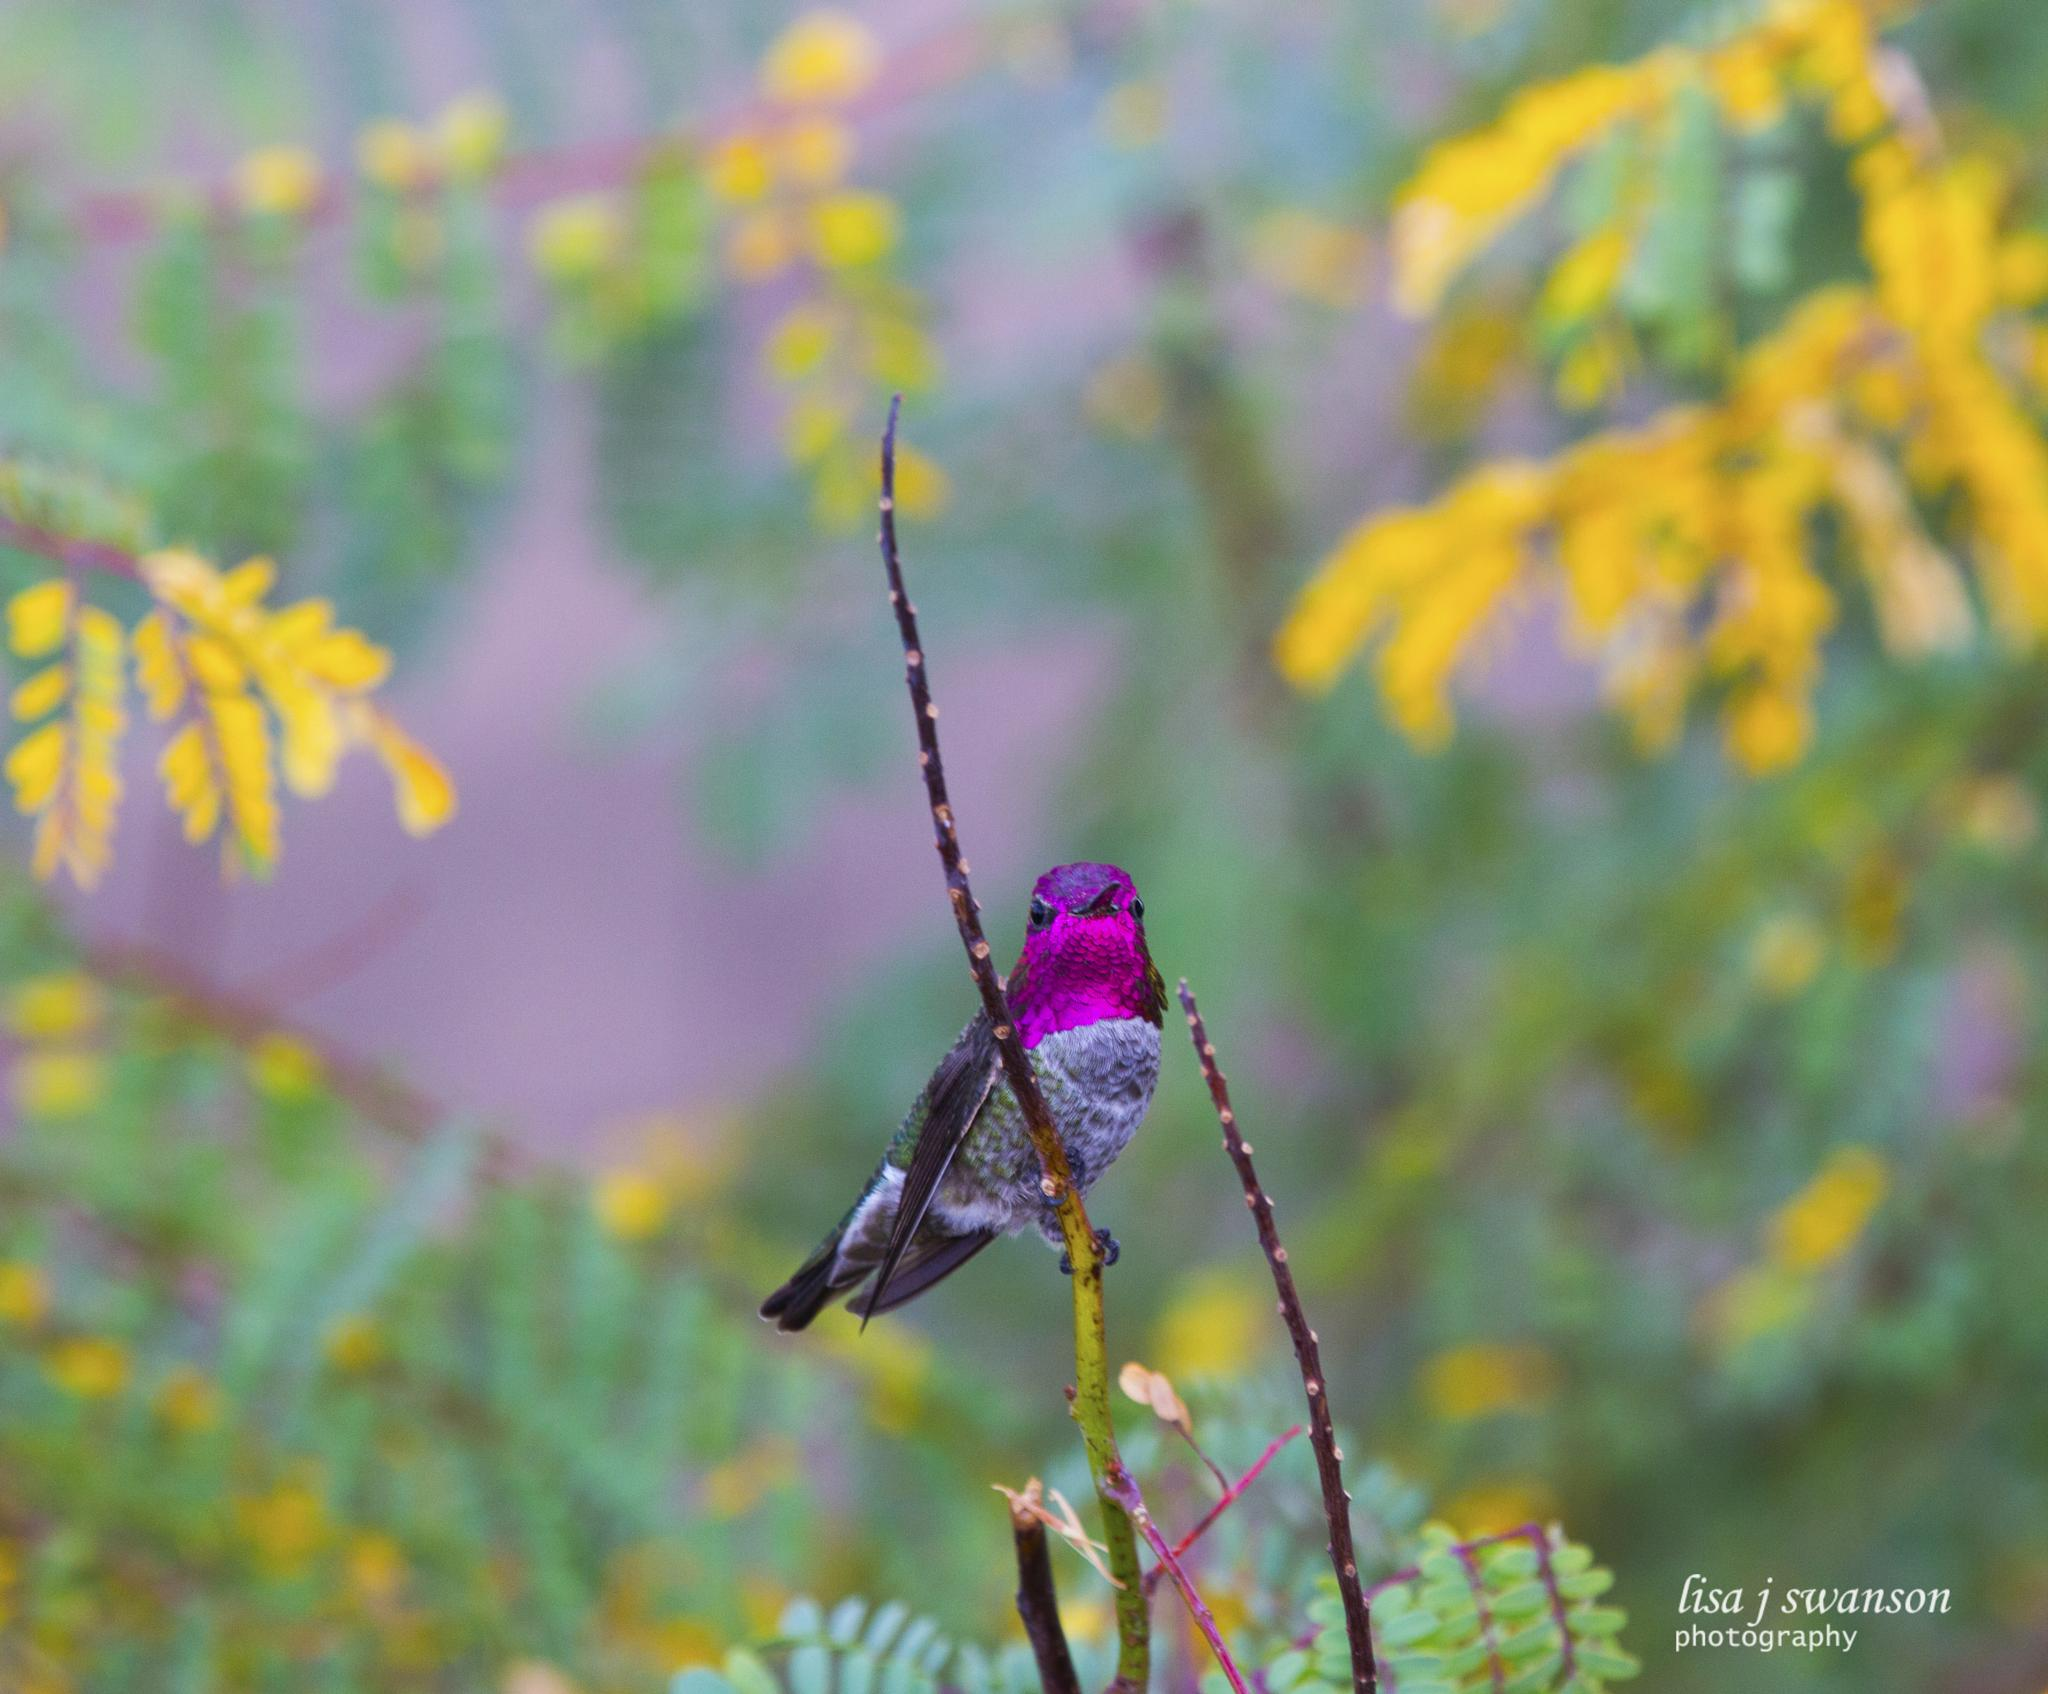 Male Anna's hummingbird with beautiful gorget by lisa.meyersswanson